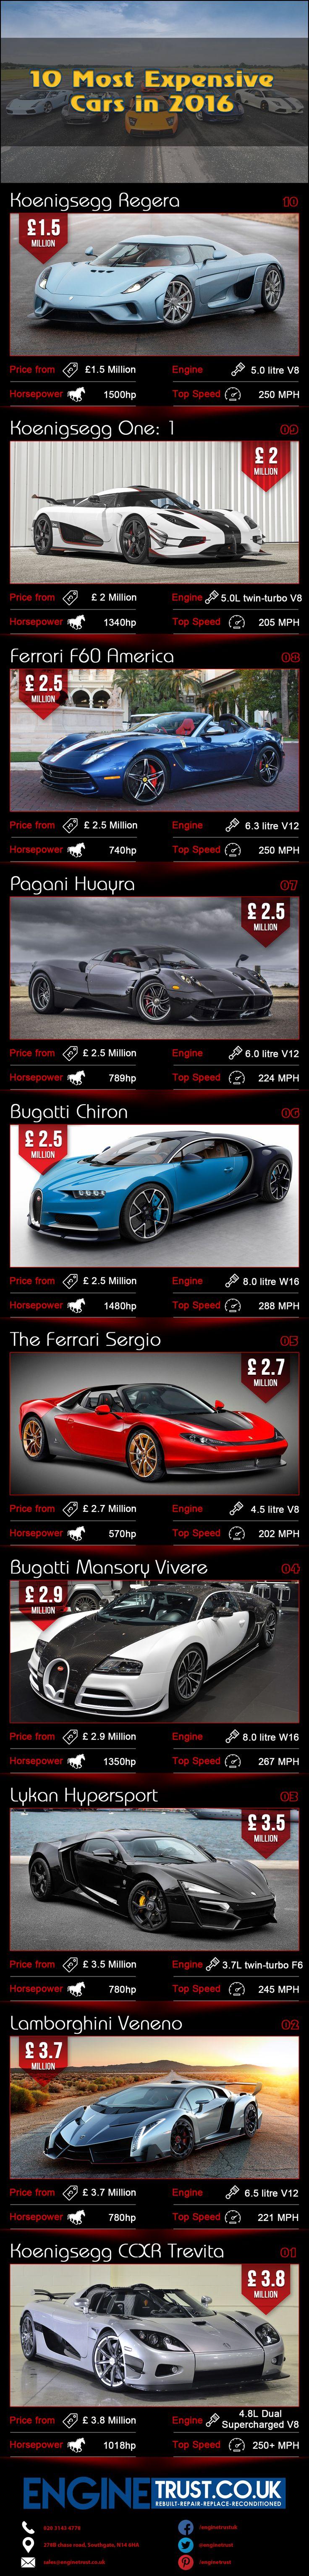 919df7da23d935b3973a7d6d95745286 Outstanding Bugatti Veyron Price In Kolkata Cars Trend